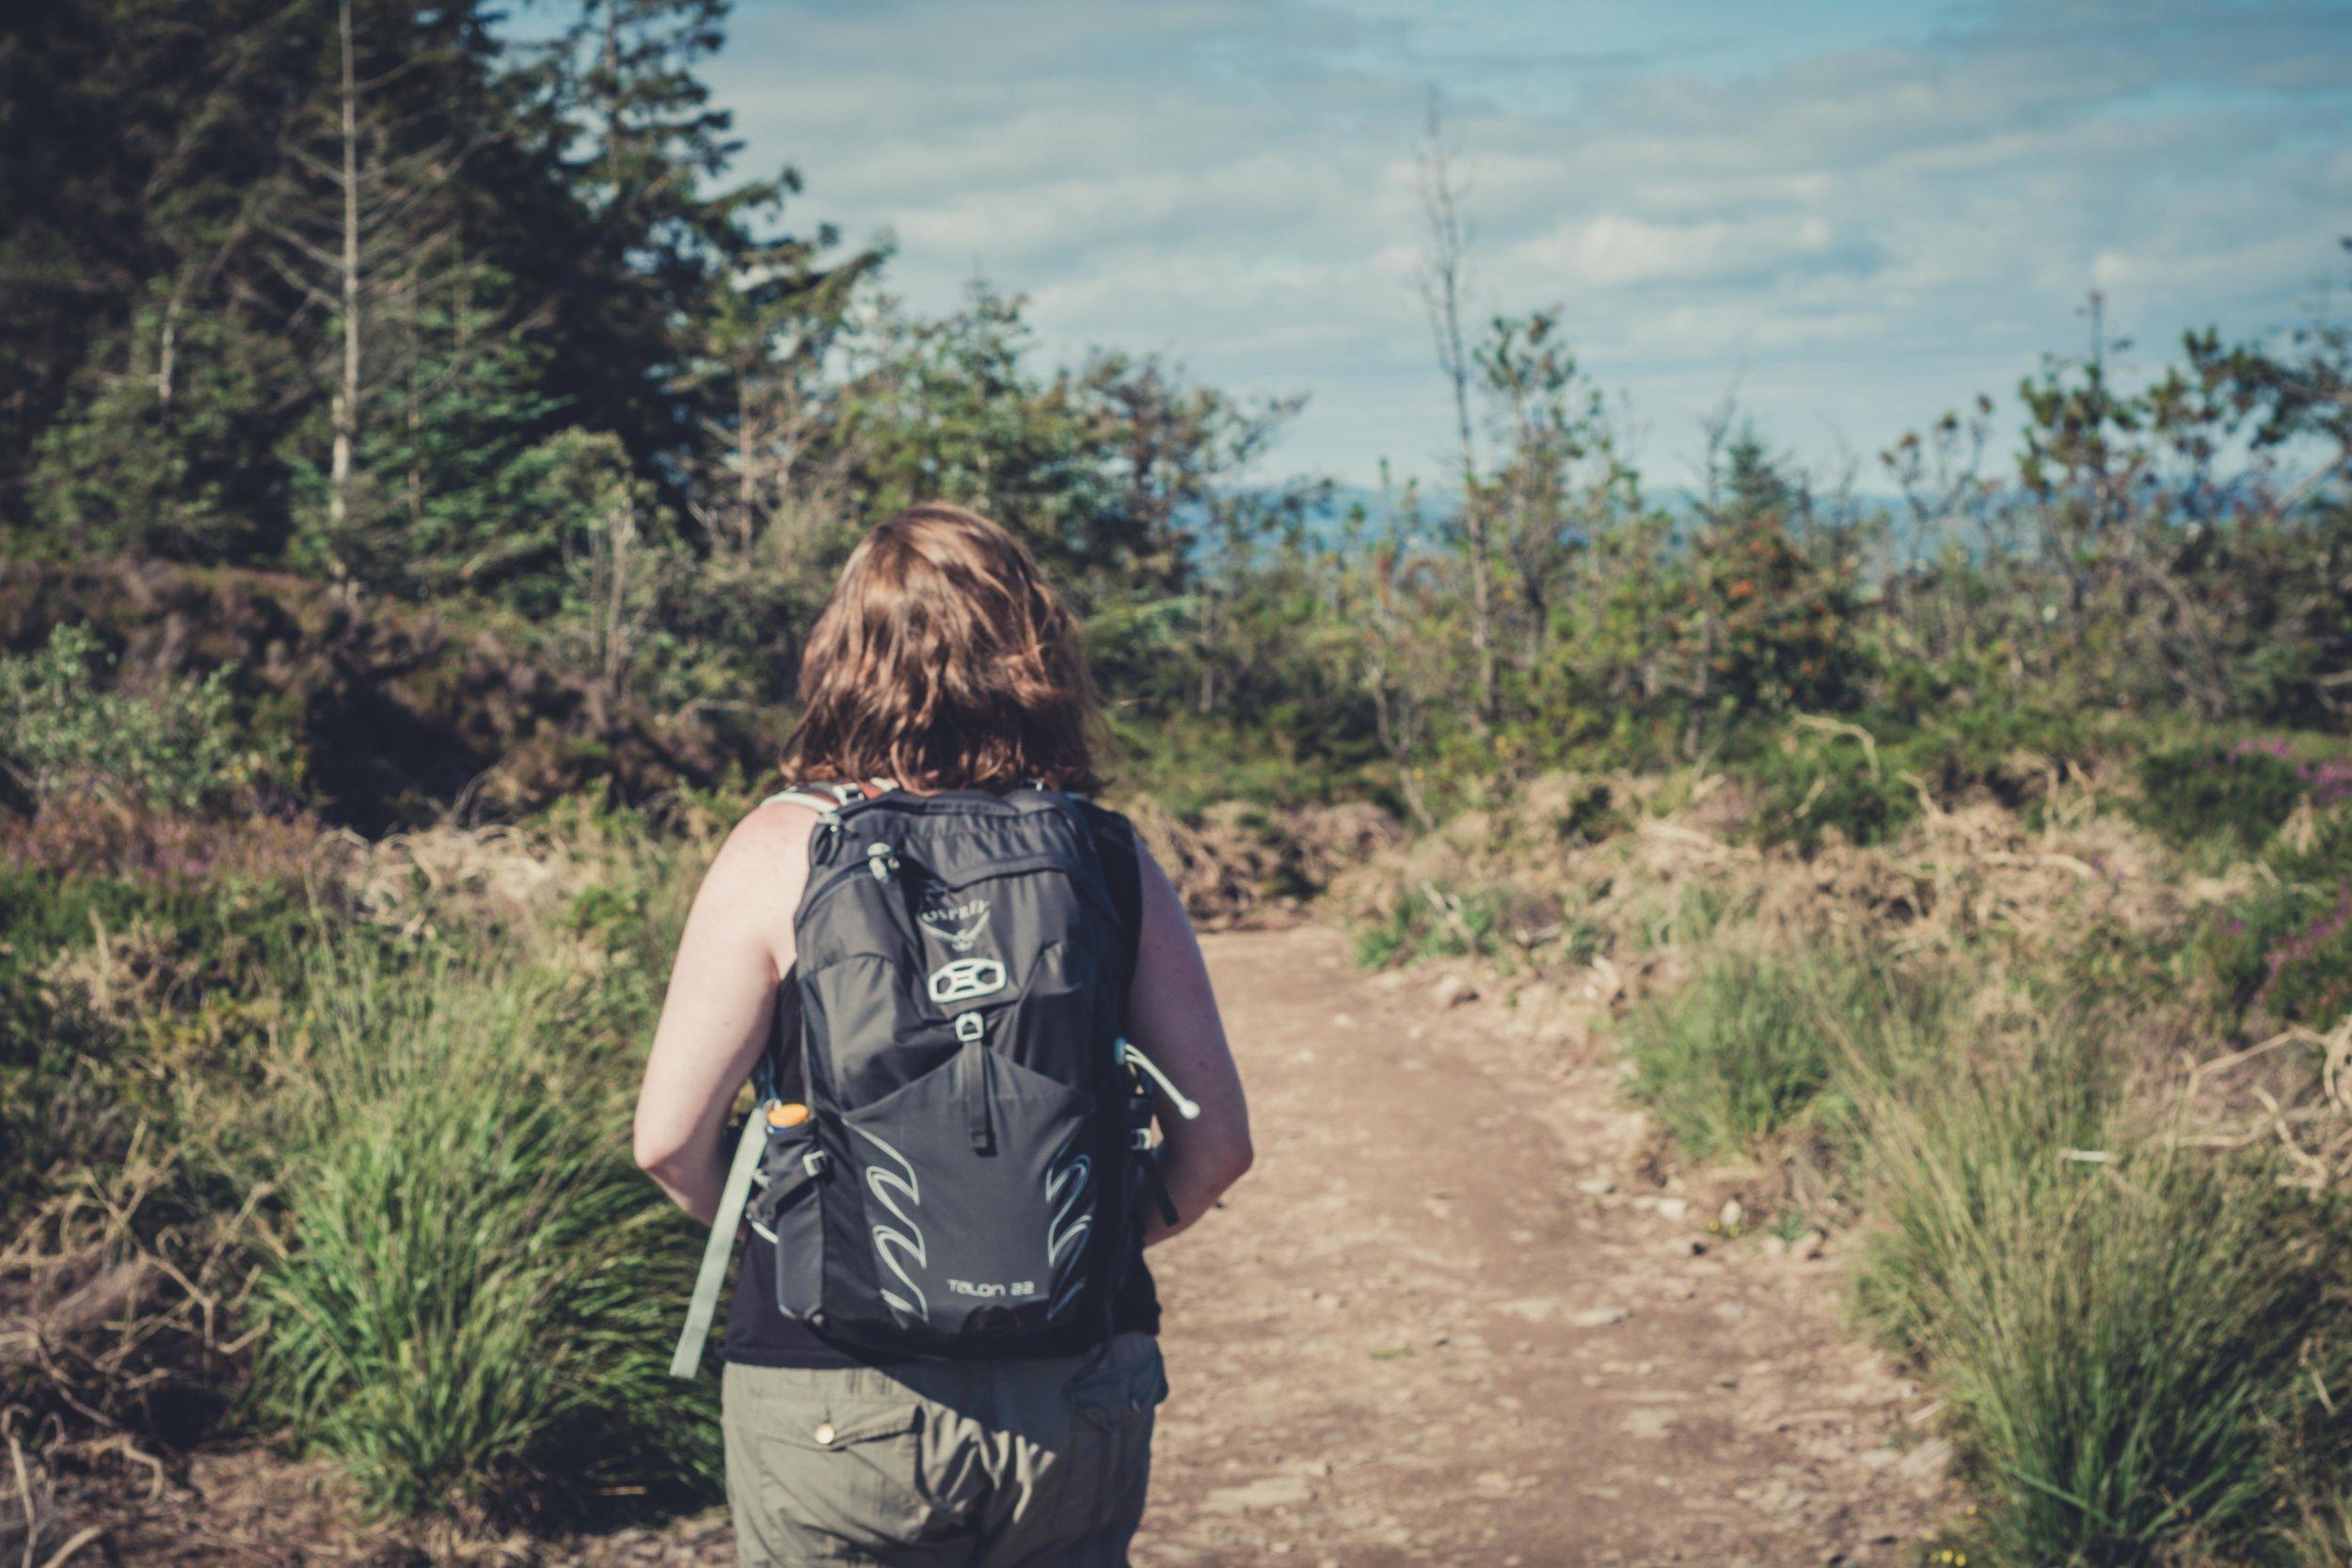 county cork. cork. ireland. irish. history. city. house sitting. old. travel. travel photography. travel photographer. lough hyne. hiking. outdoor. adventure. osprey backpack..jpg